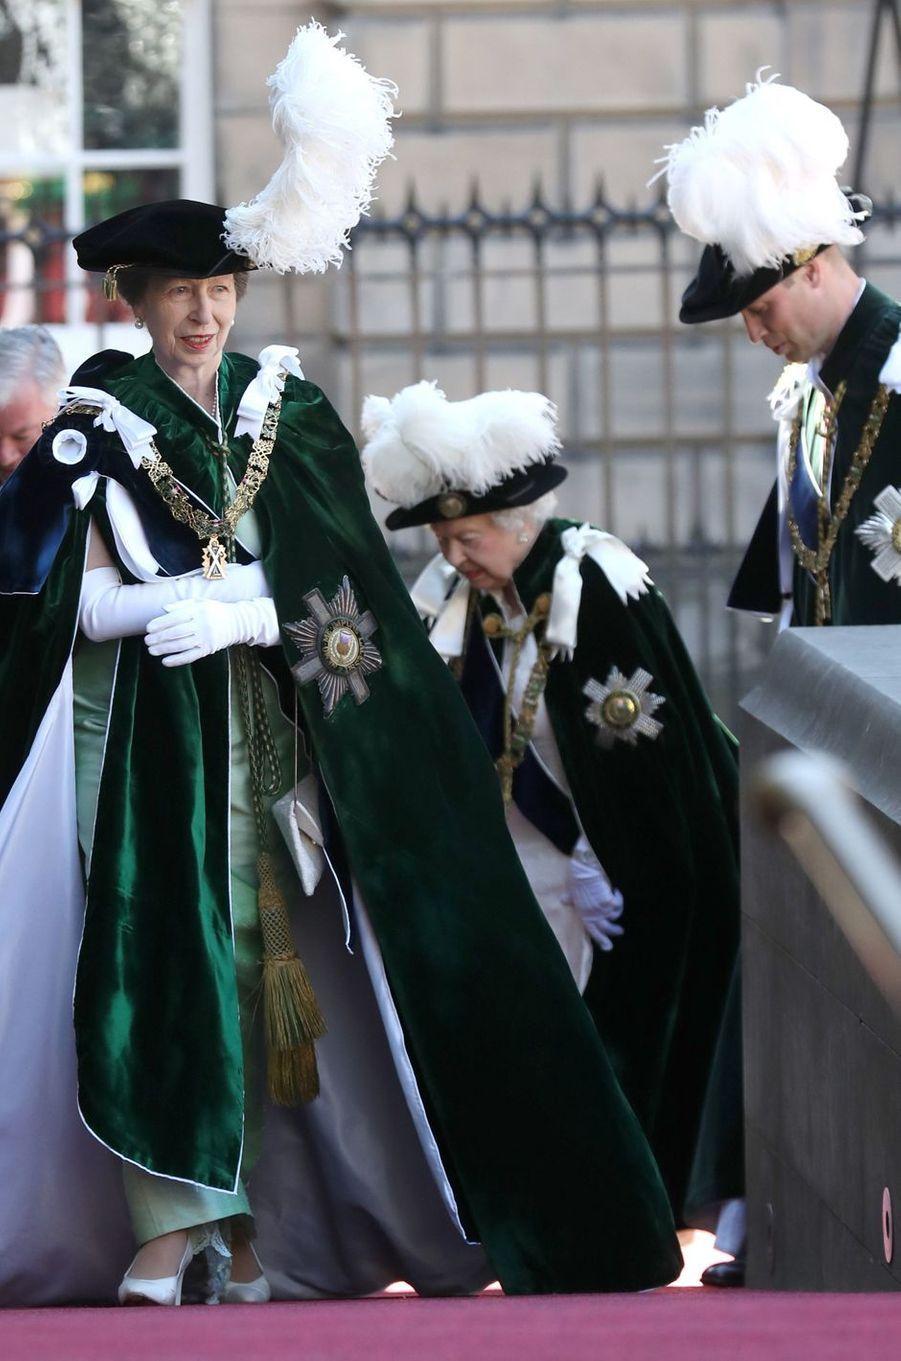 La princesse Anne, la reine Elizabeth II et le prince William à Edimbourg, le 6 juillet 2018